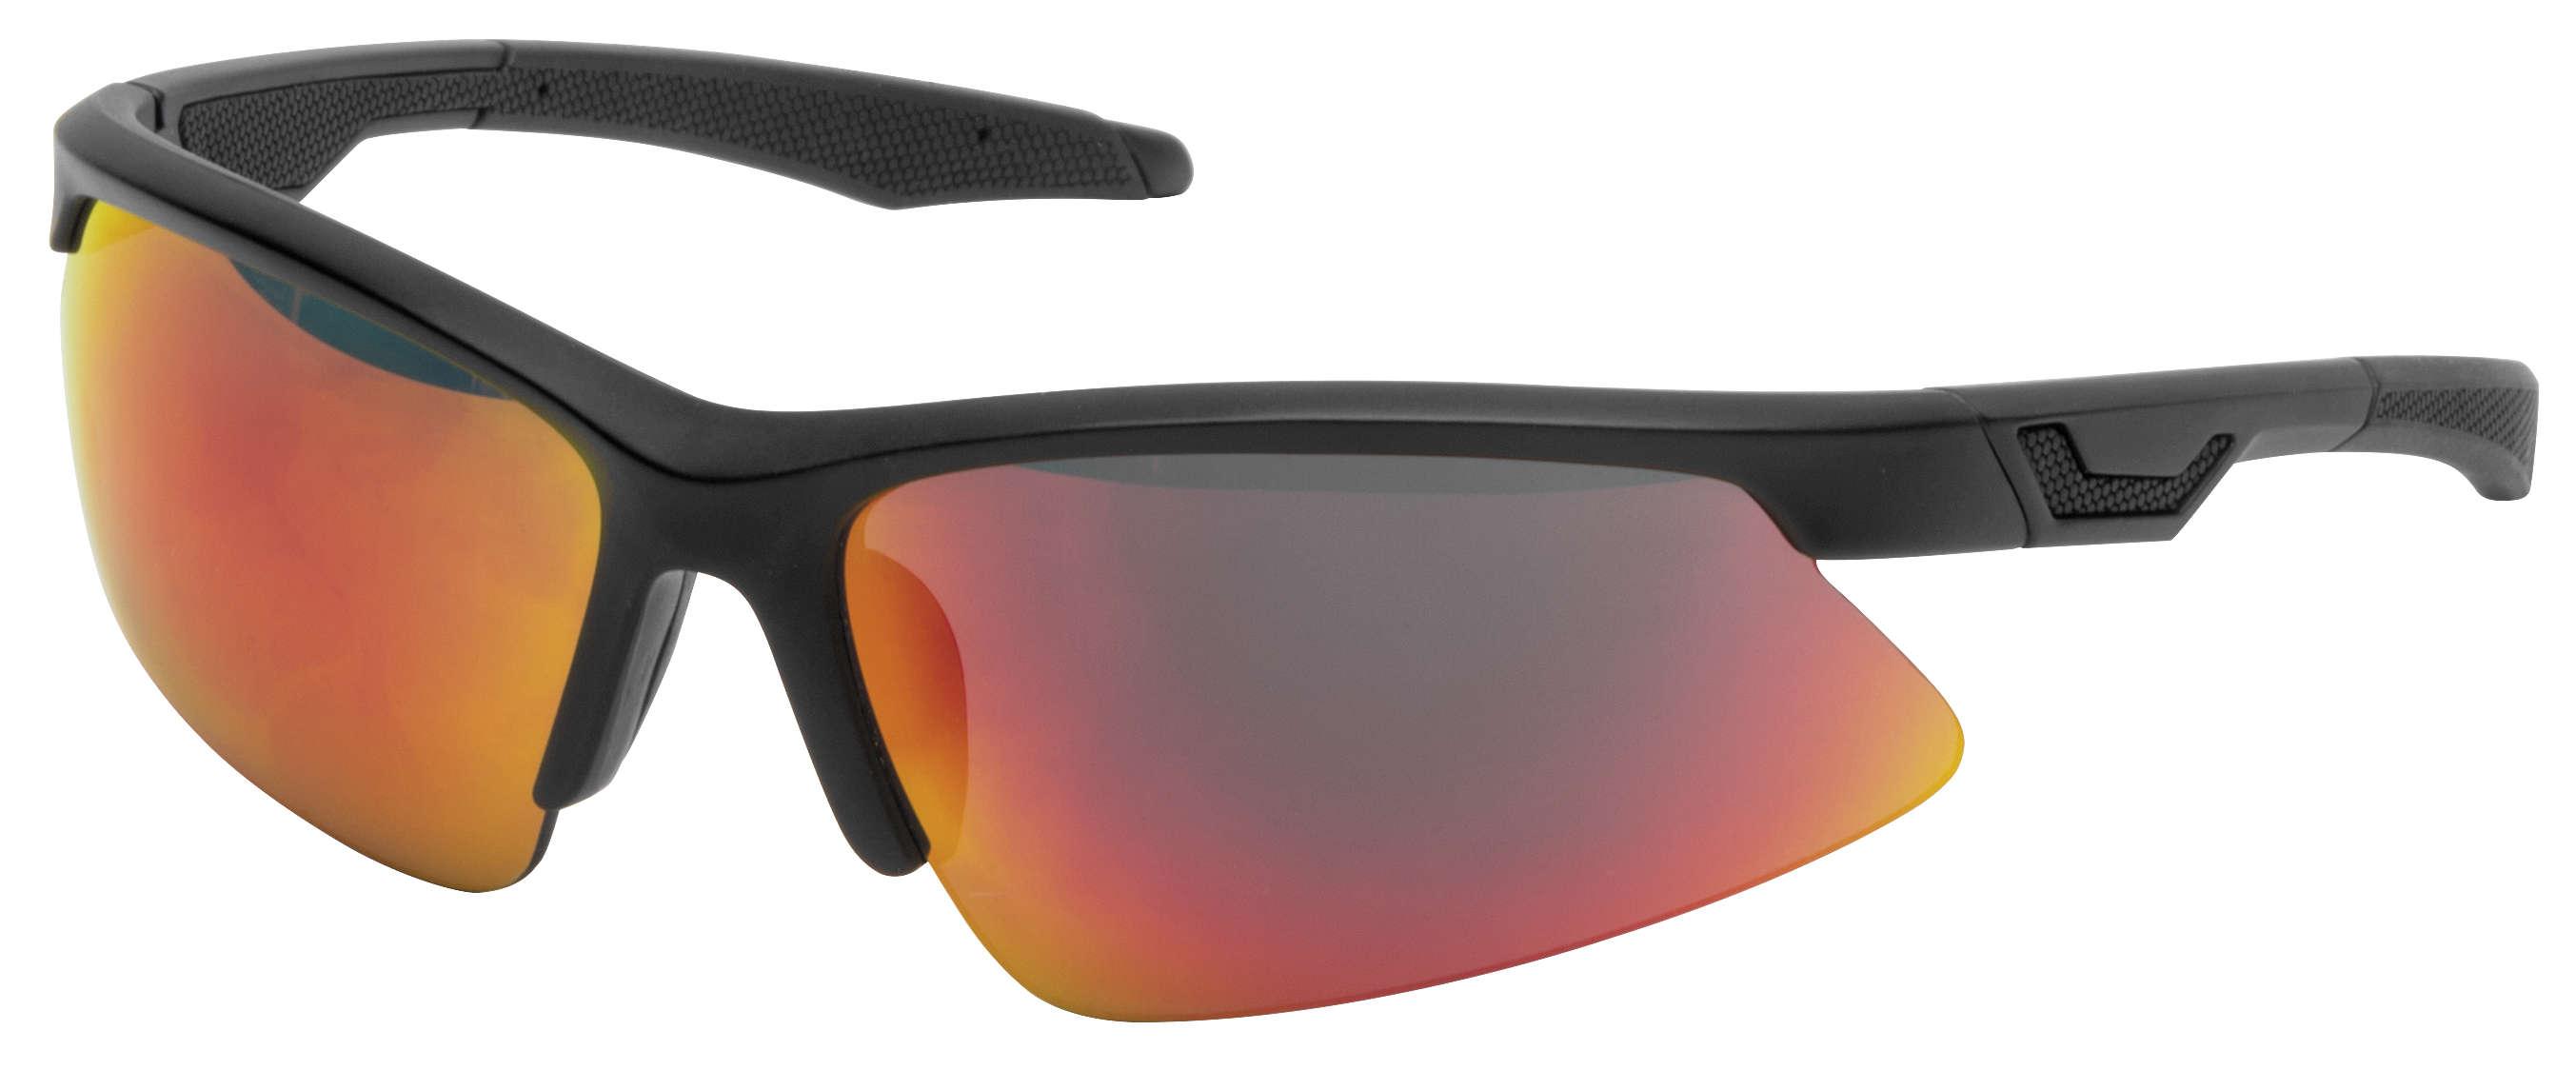 Aero Lite Sunglasses